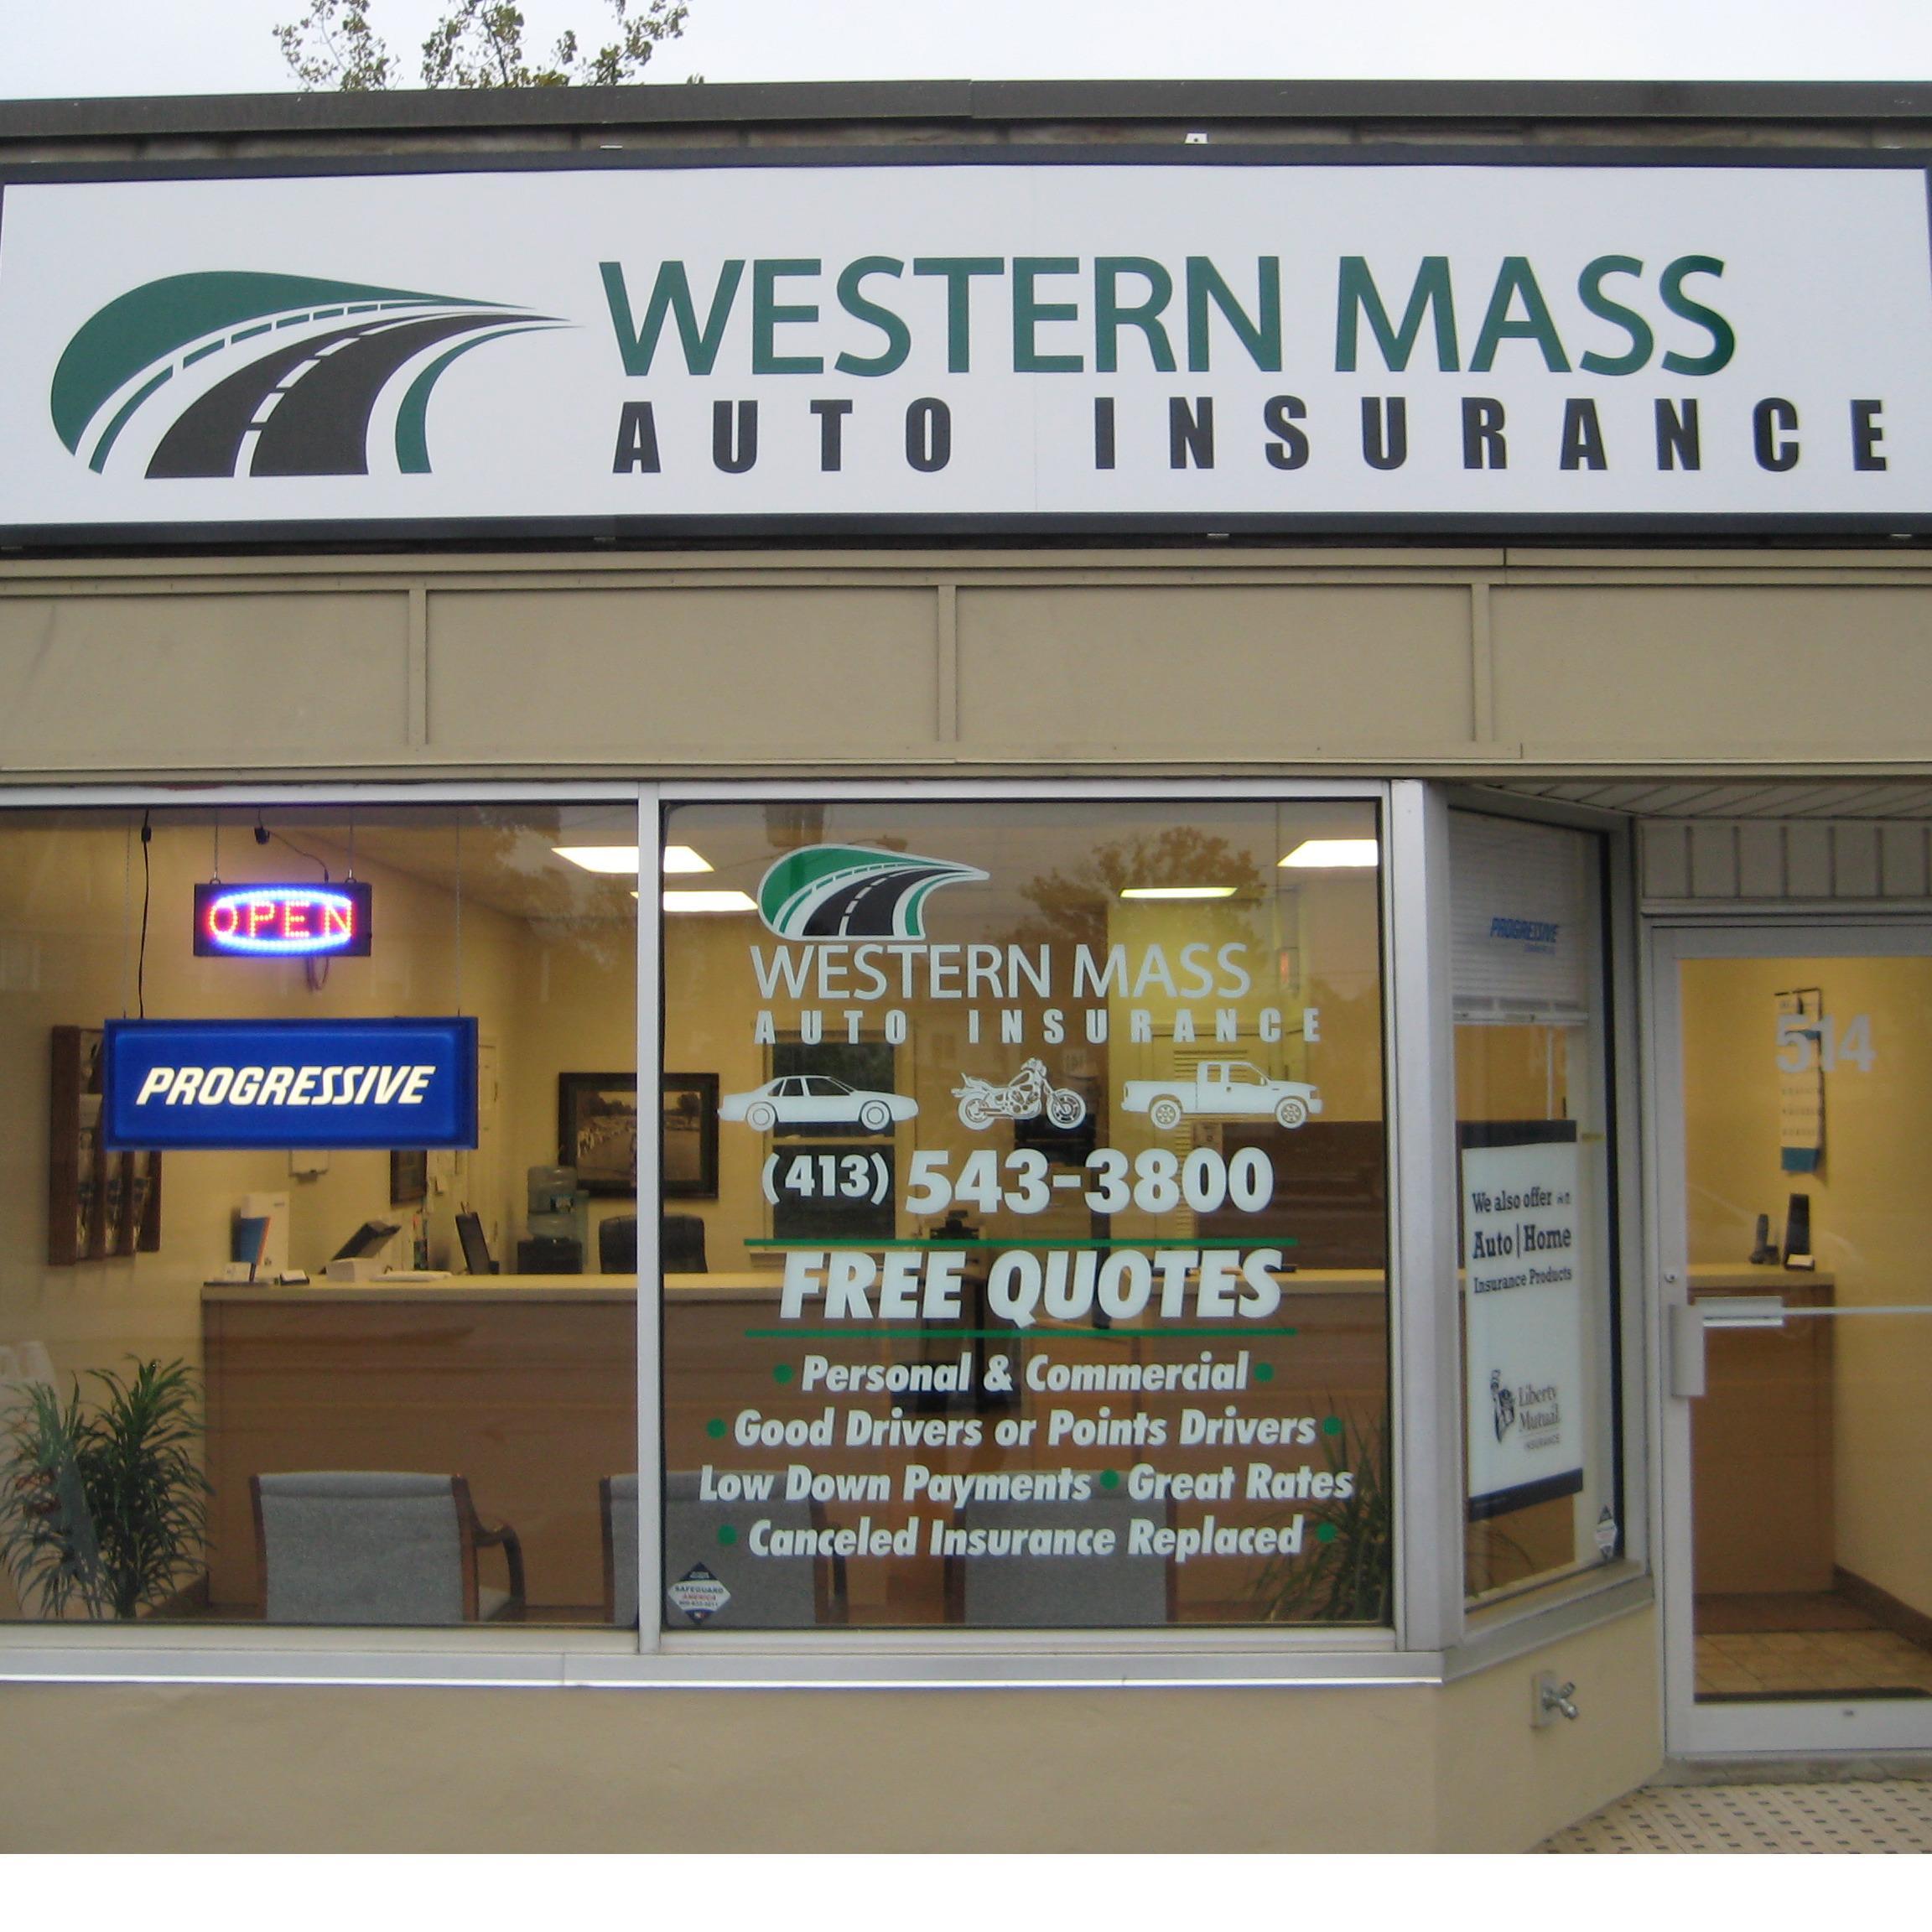 Western Mass Auto Insurance Inc.